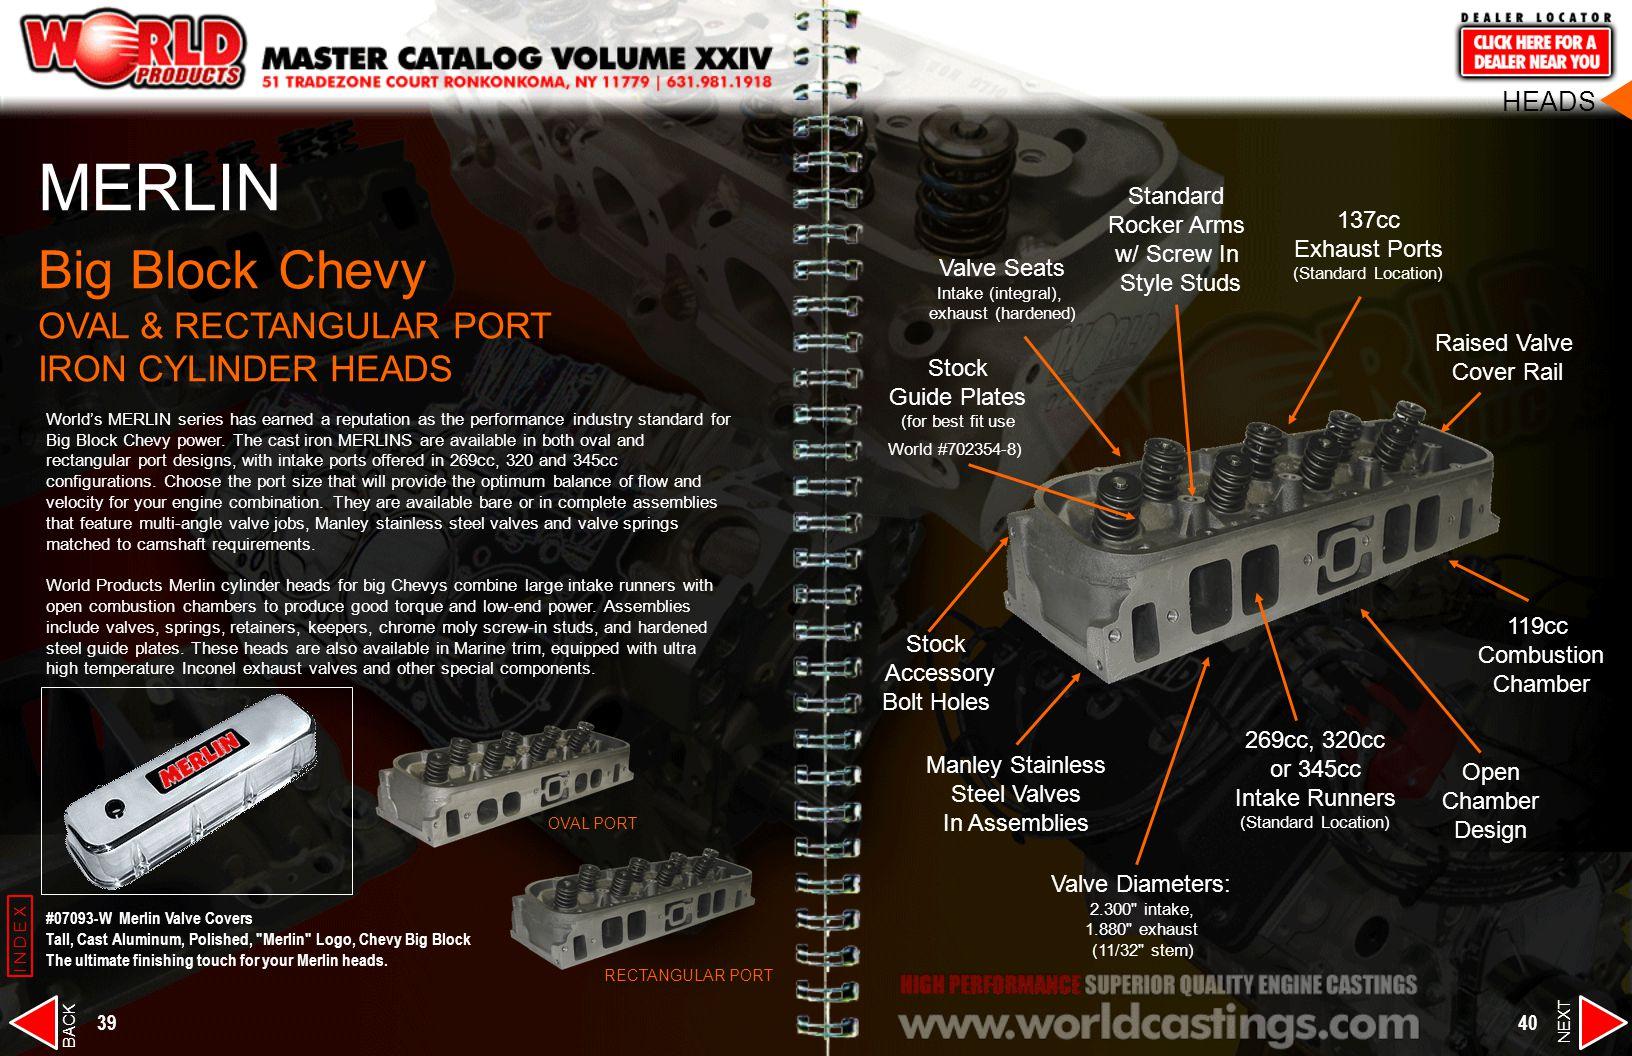 MERLIN Big Block Chevy OVAL & RECTANGULAR PORT IRON CYLINDER HEADS